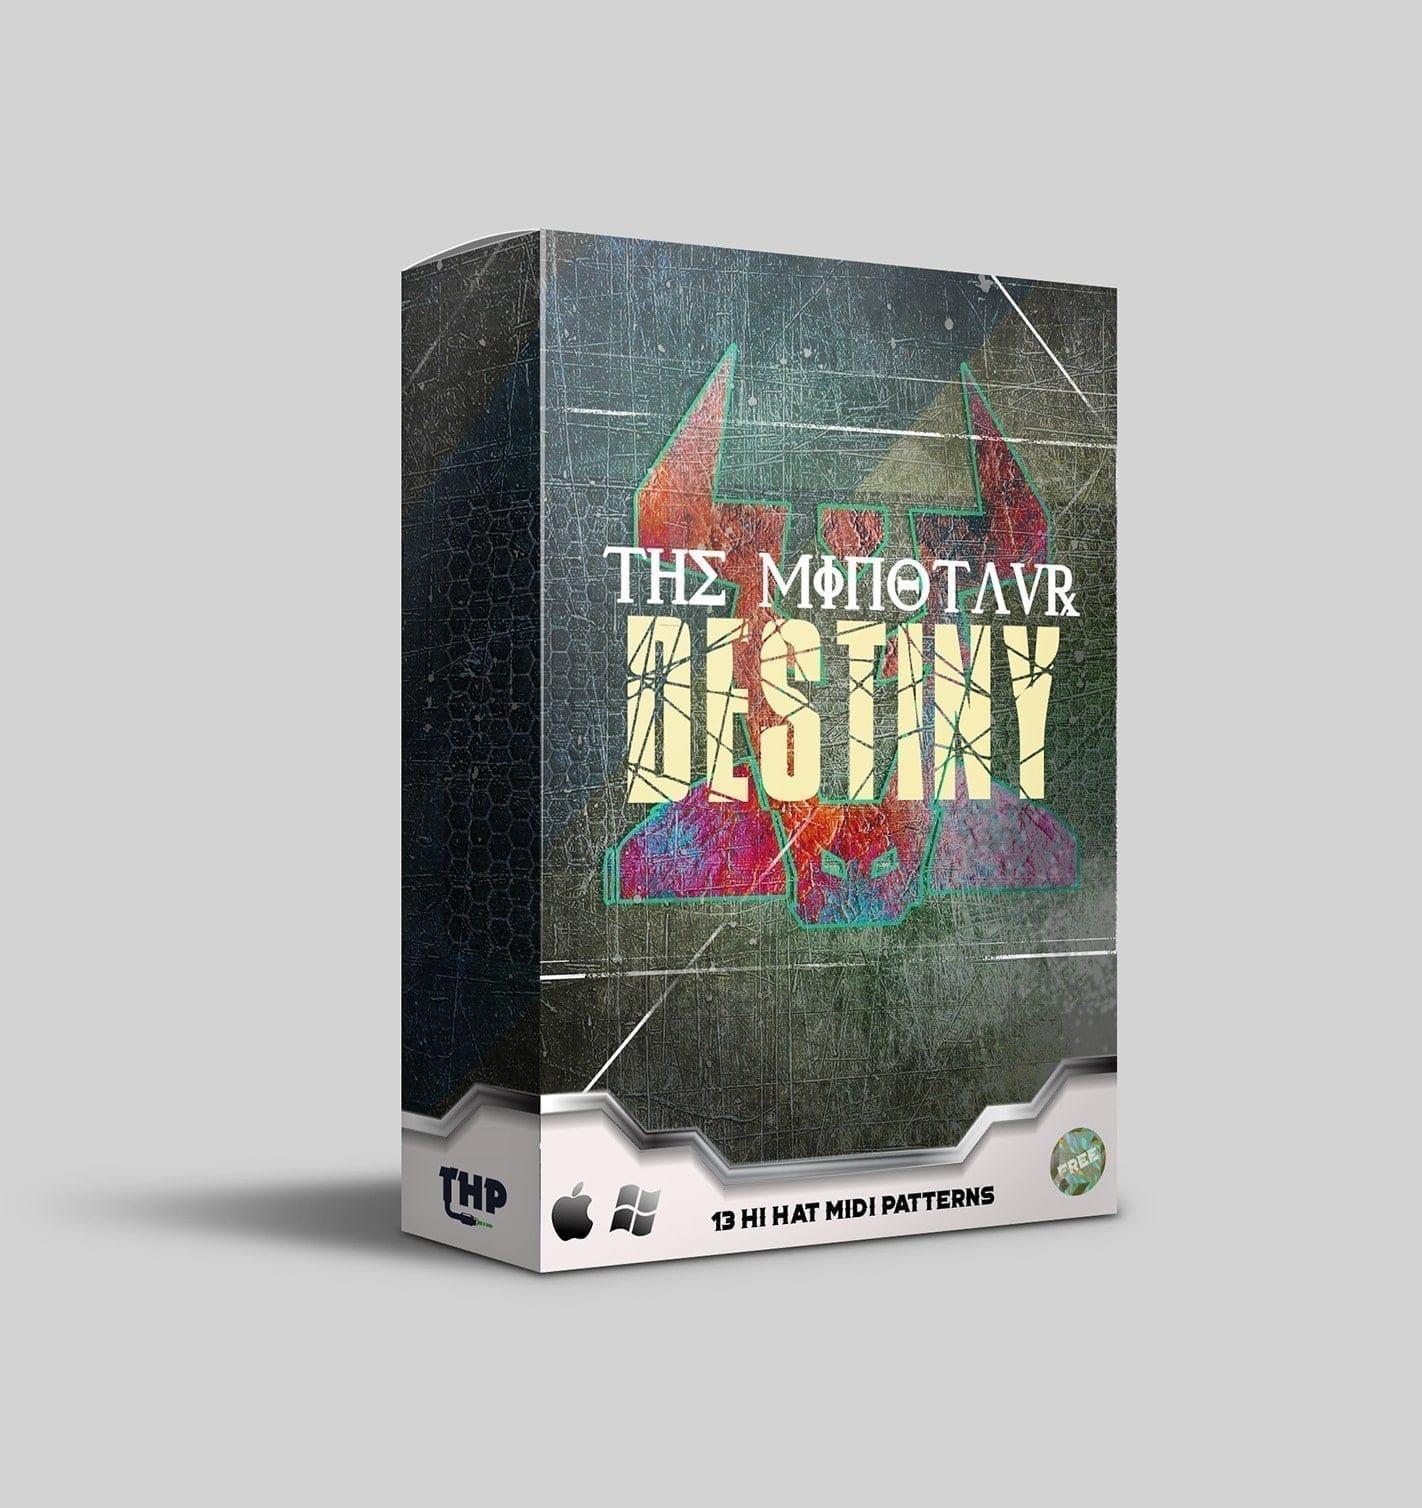 The Minautor Destiny Free Hi Hat MIDI Rolls for Trap and Hip Hop